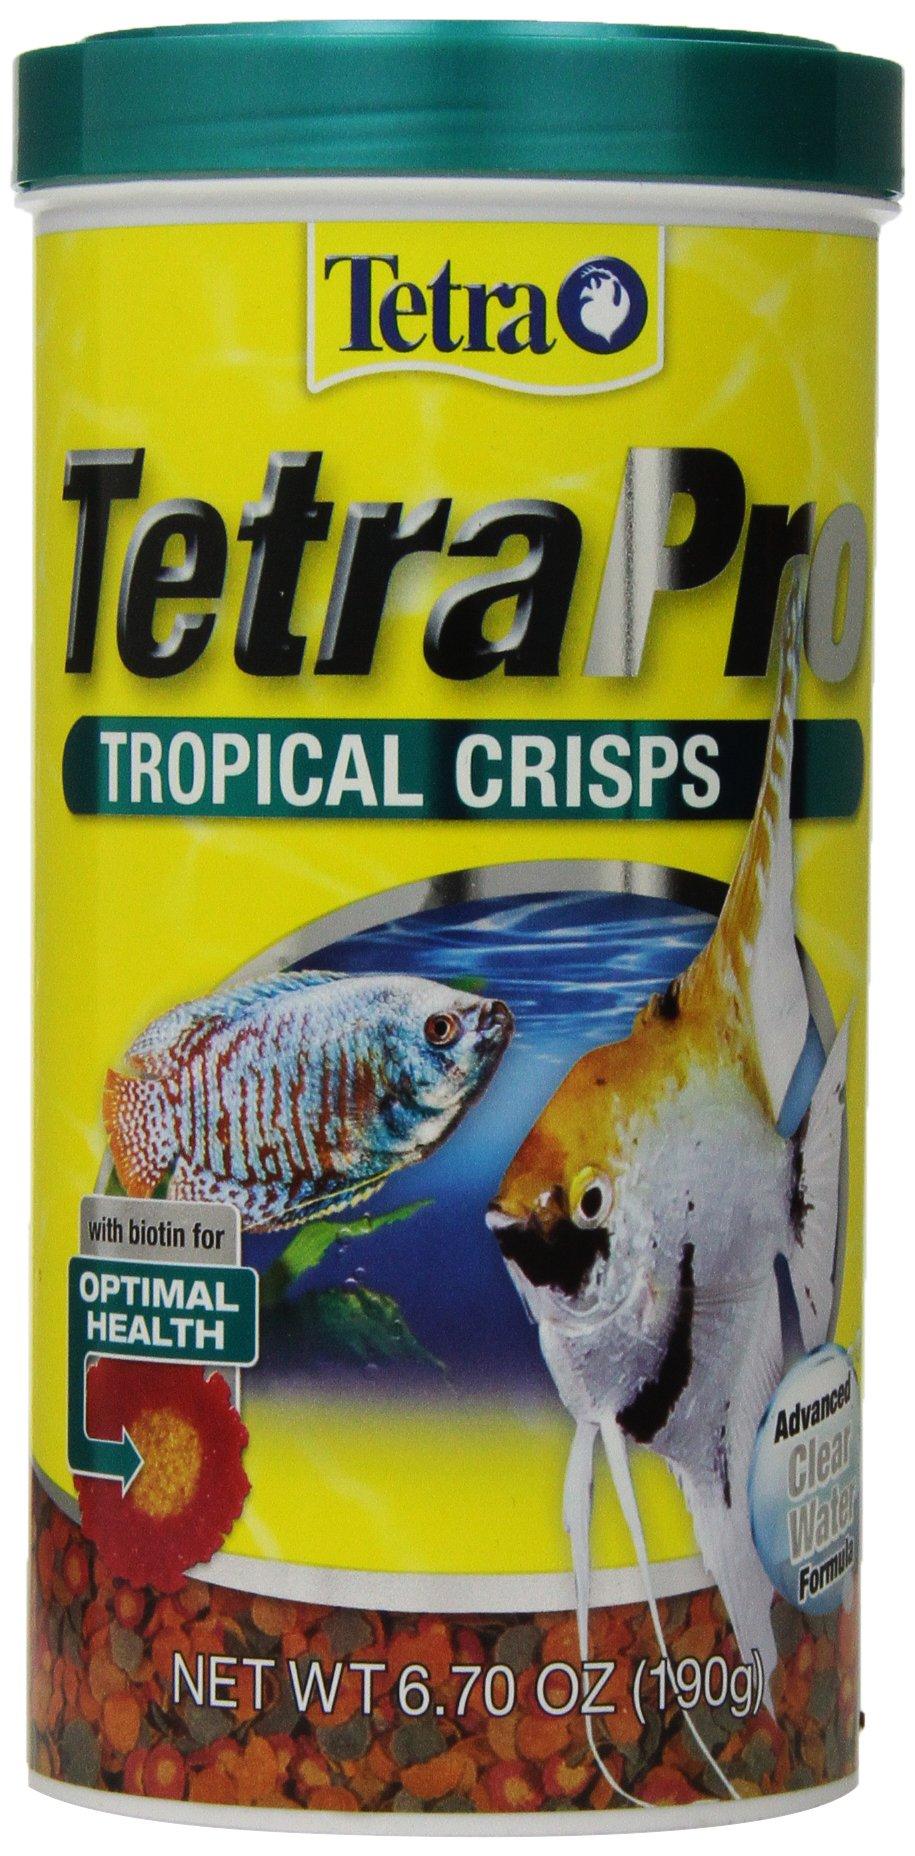 TetraPro Tropical Crisps 6.70 Ounces, Fish Food, Advanced Clear Water Formula